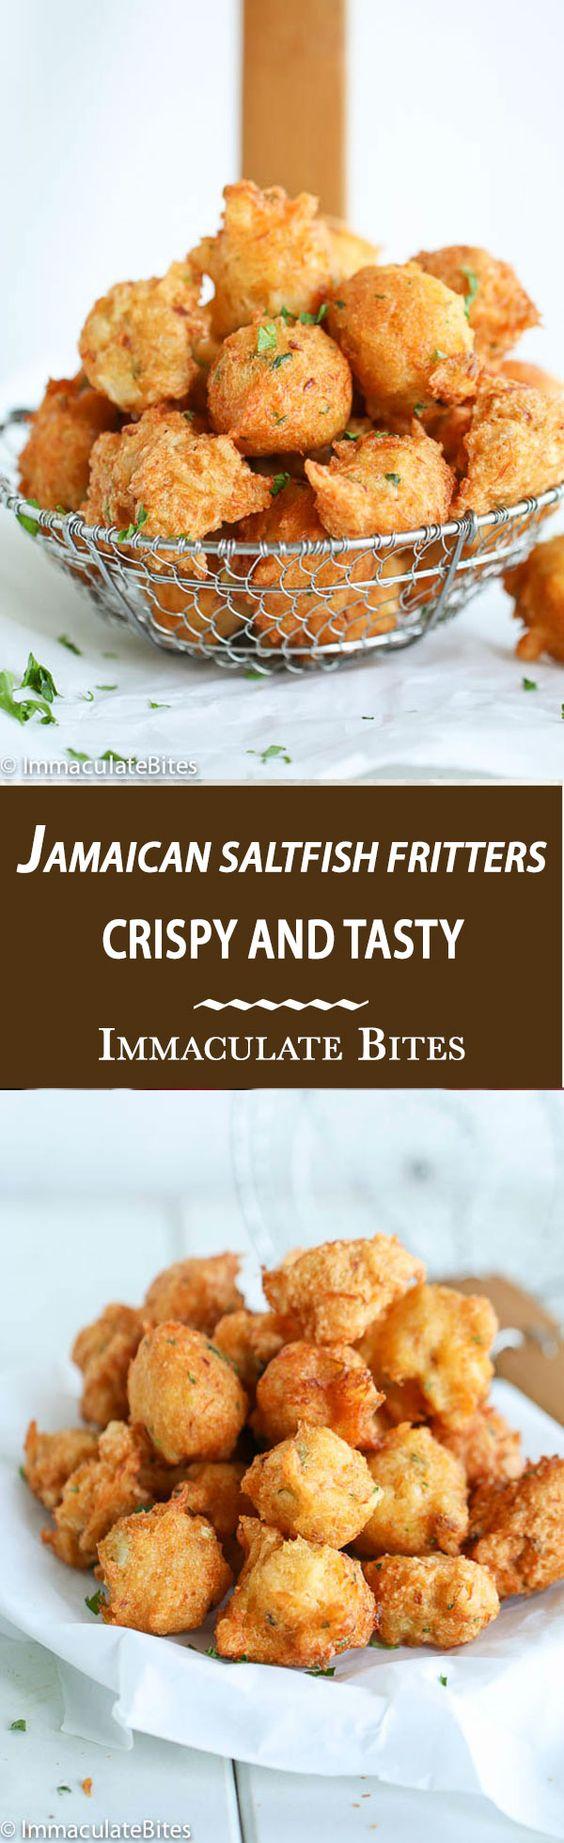 Salt fish fritters recipe salts planes and caribbean for Jamaican salt fish